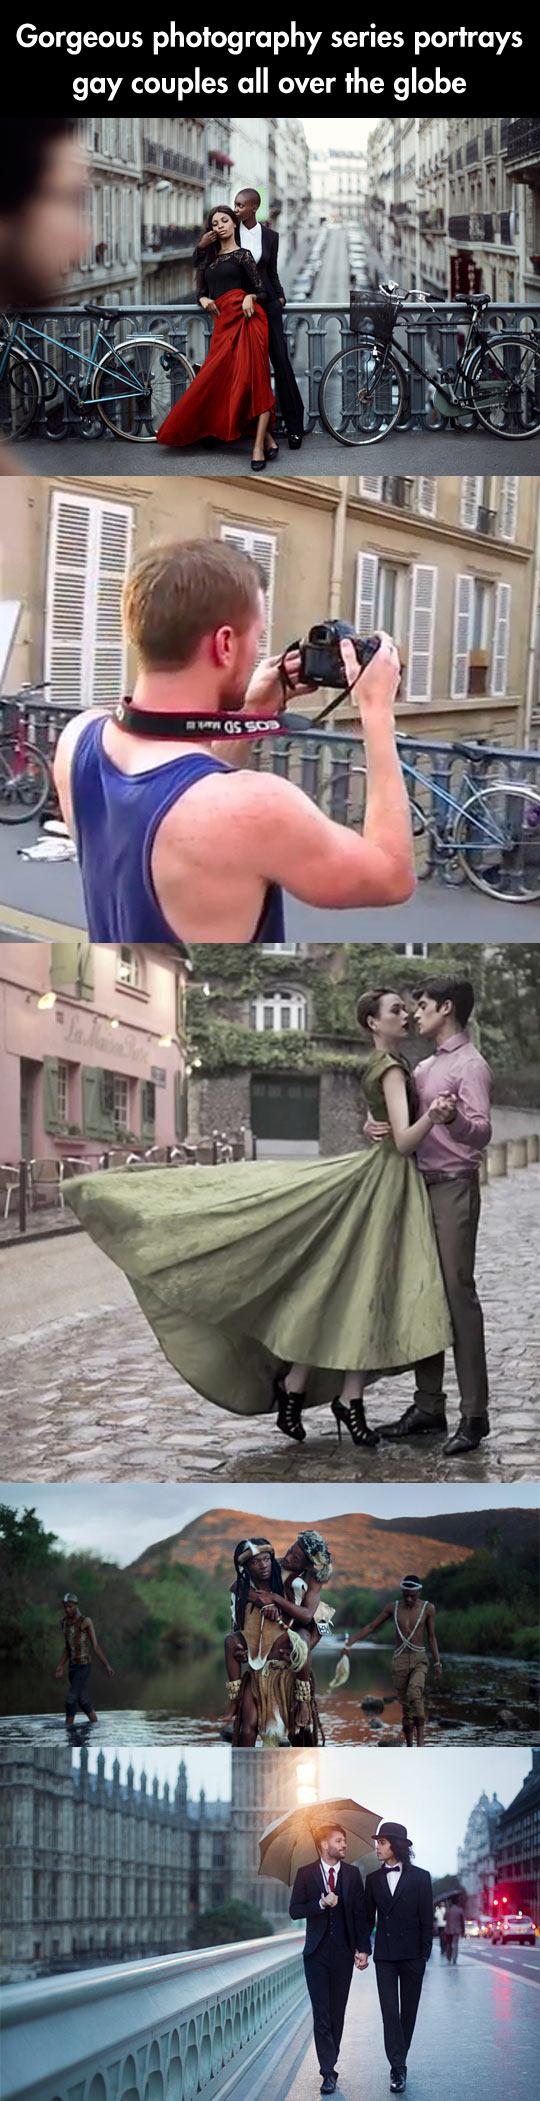 Romance with a single click